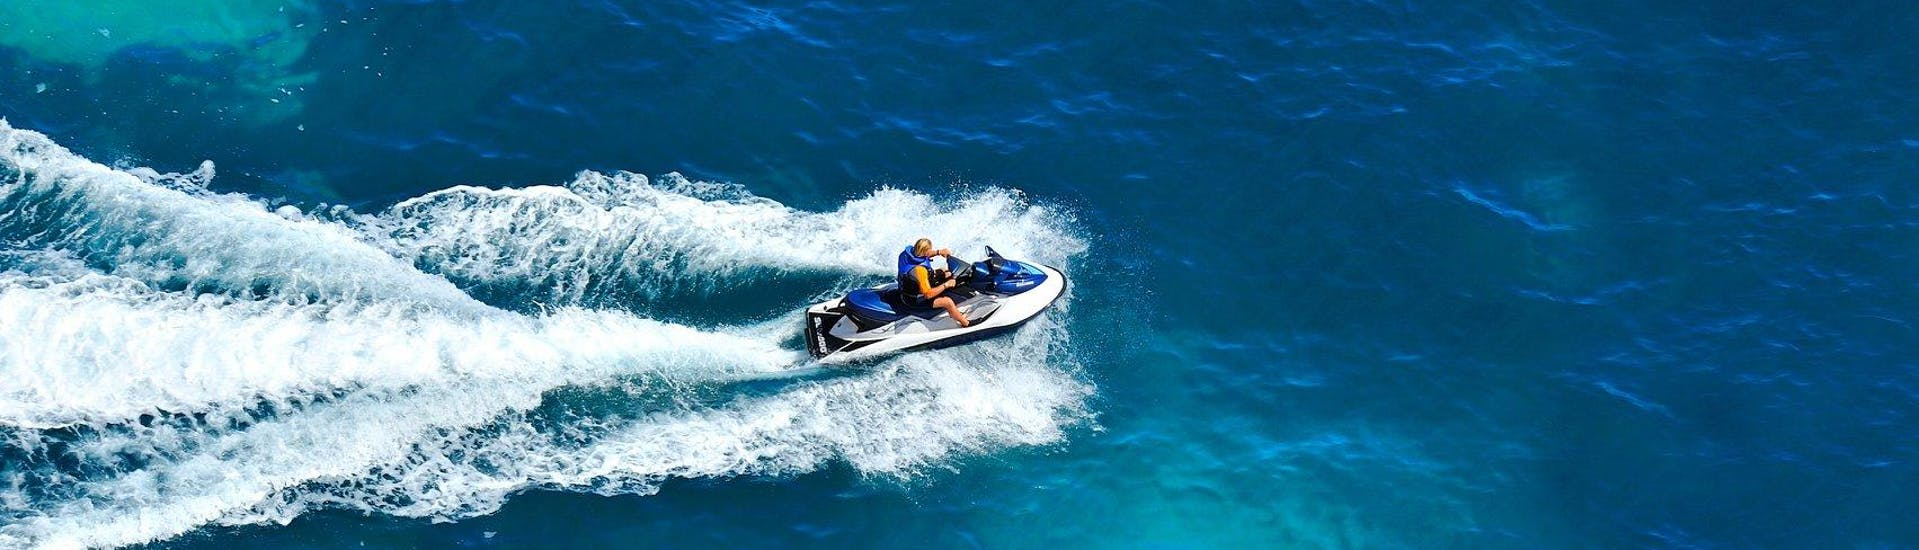 Jetski Safari to Cabo Home & Toralla from Vigo with CiesJet Vigo - Hero image